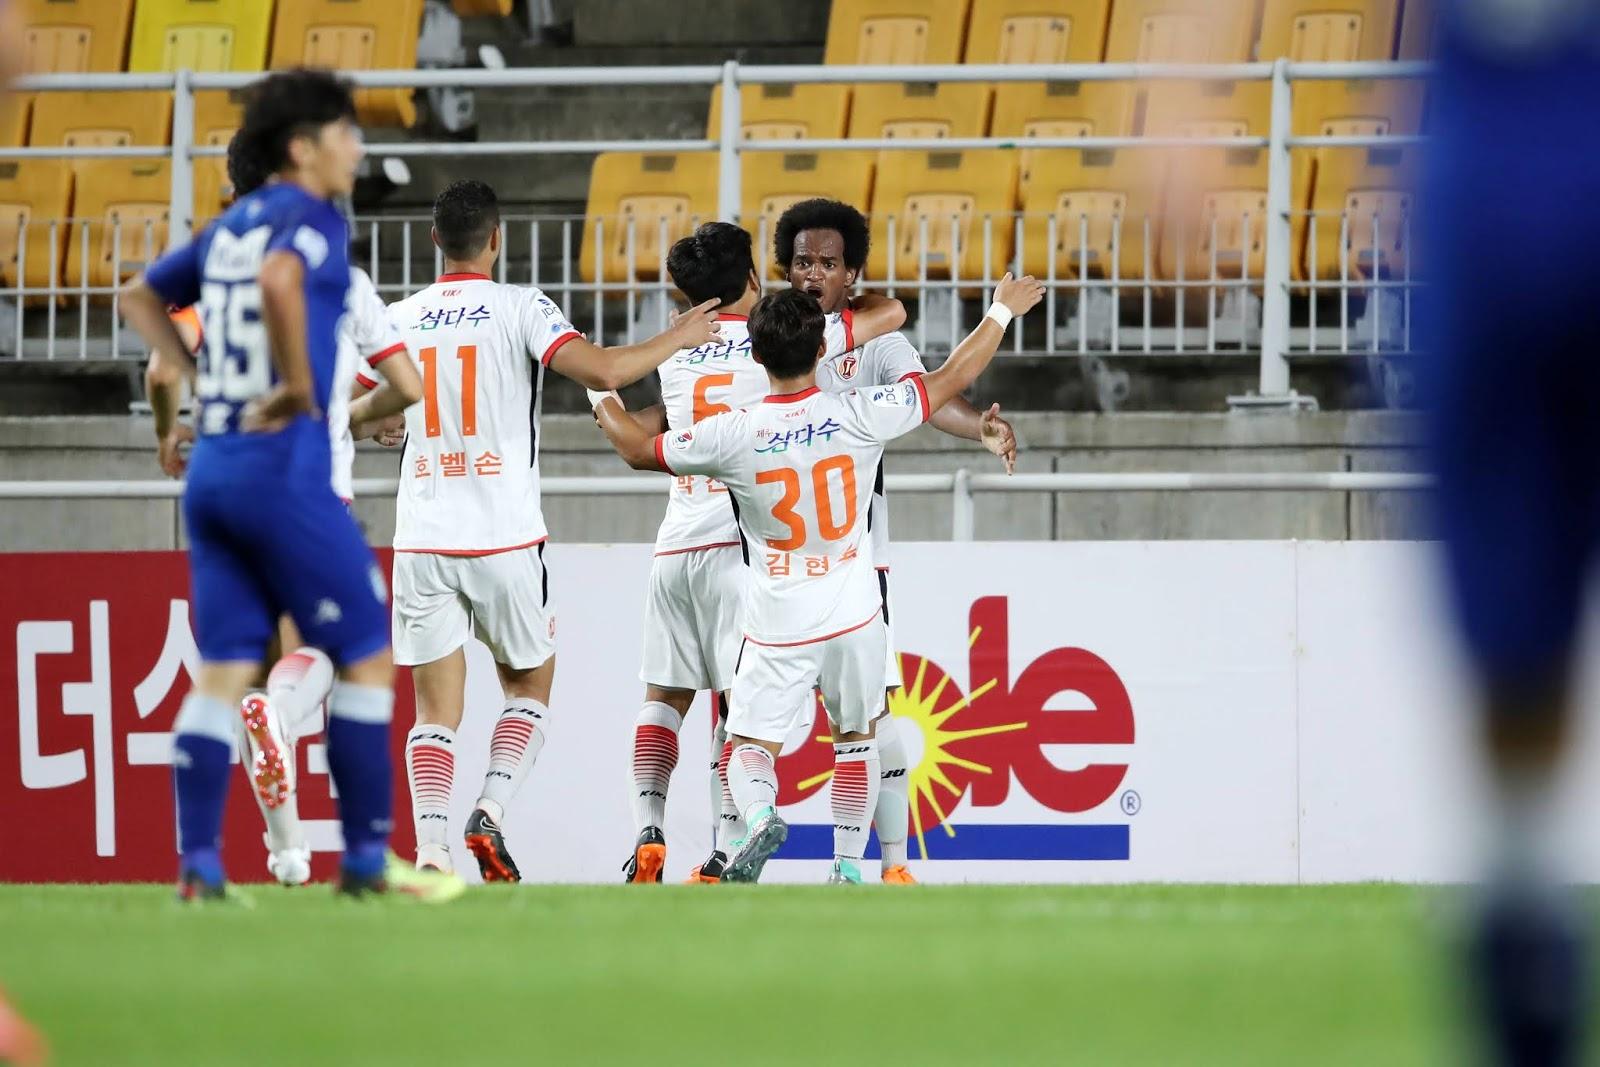 K league 1 Round 16 Preview: Jeju United vs Gyeongnam FC